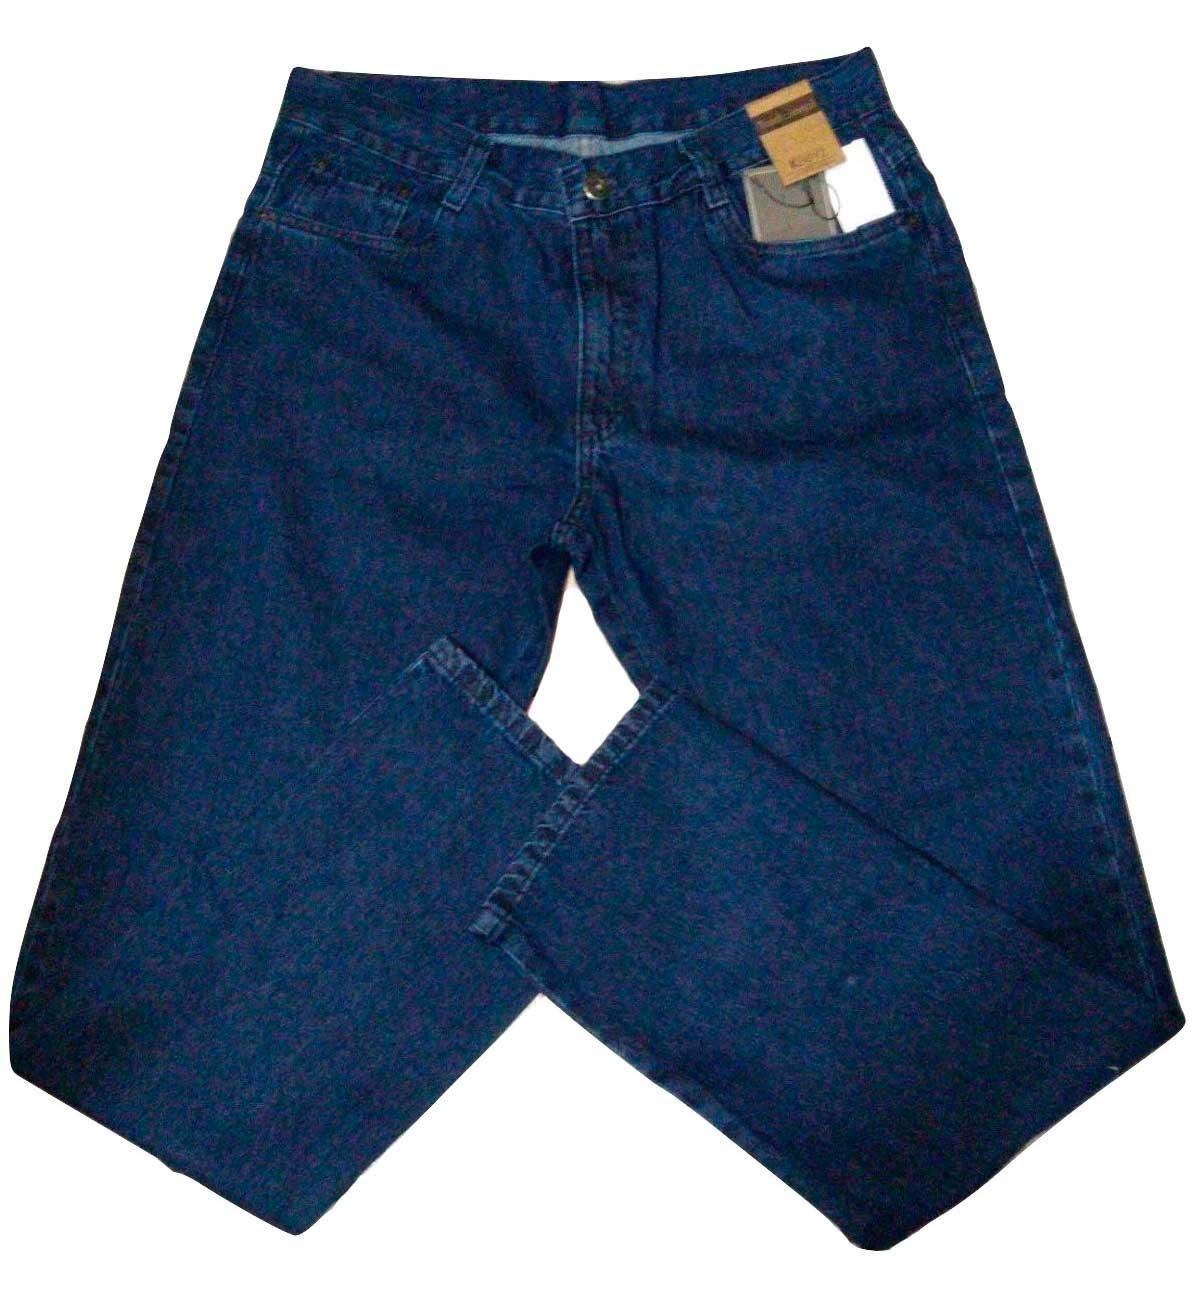 Calça Masculina Jeans corte reto barra Tradicional